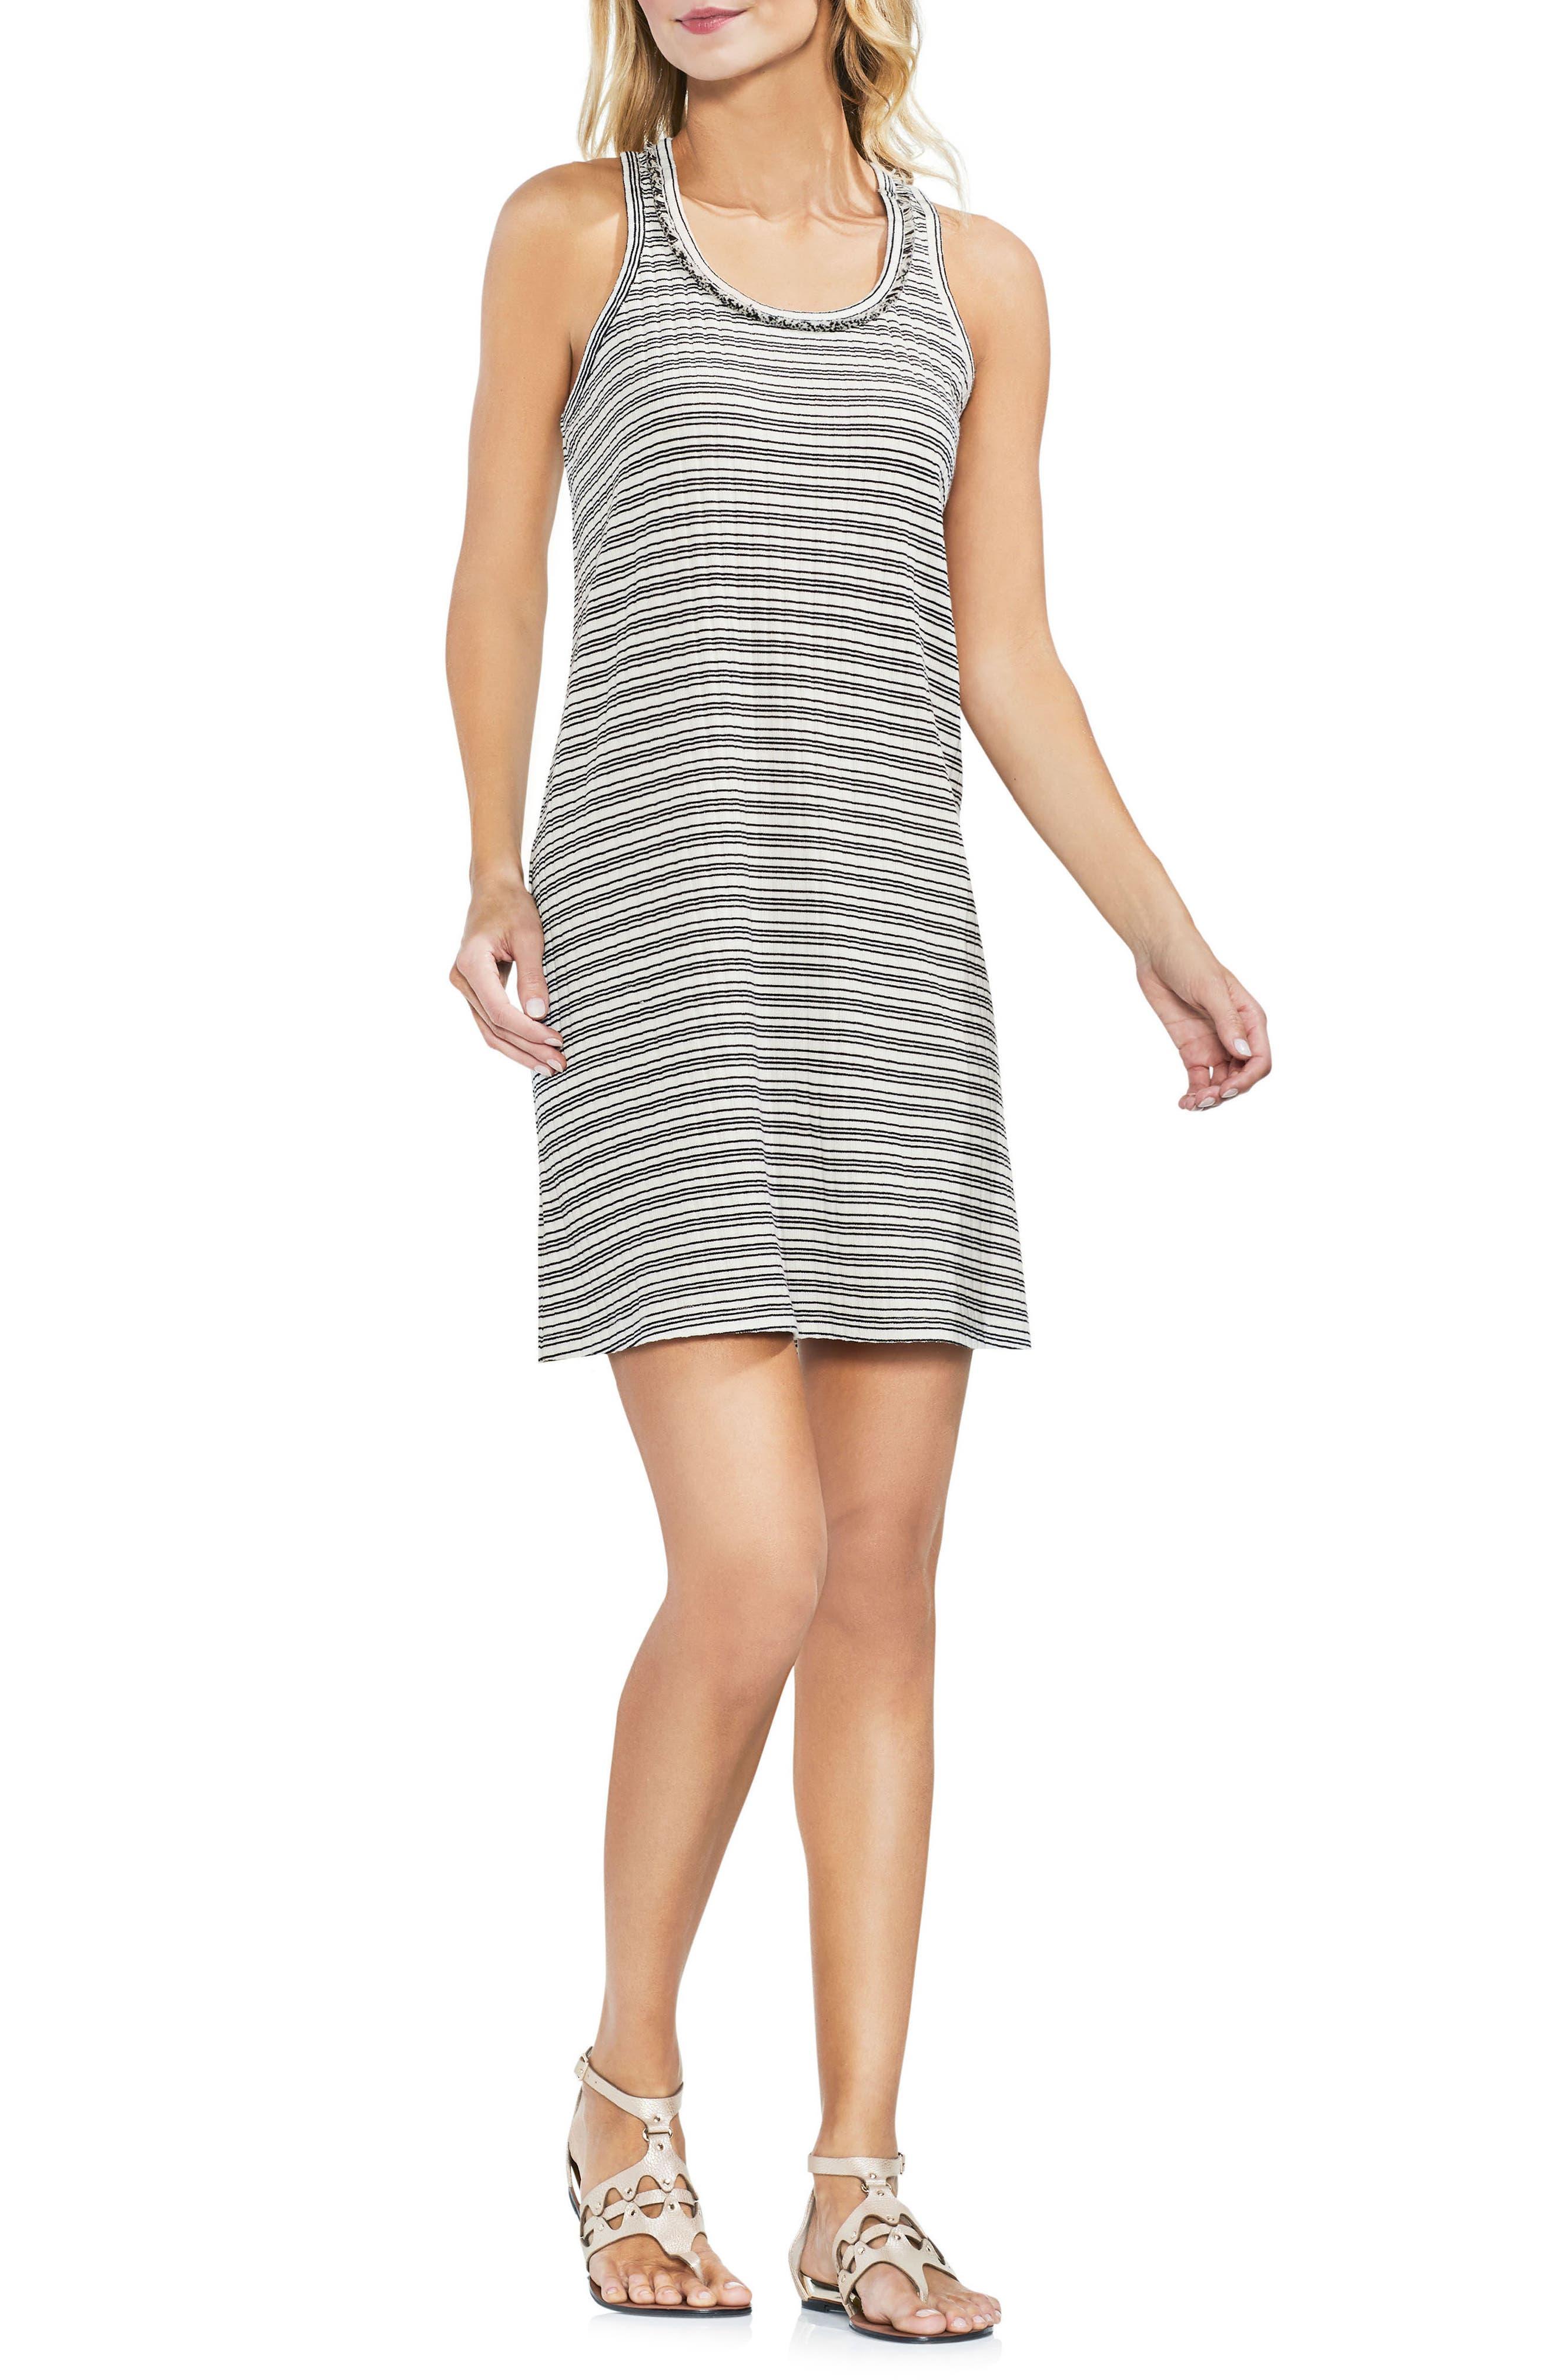 VINCE CAMUTO Ribbed Stripe Tank Dress, Main, color, 103